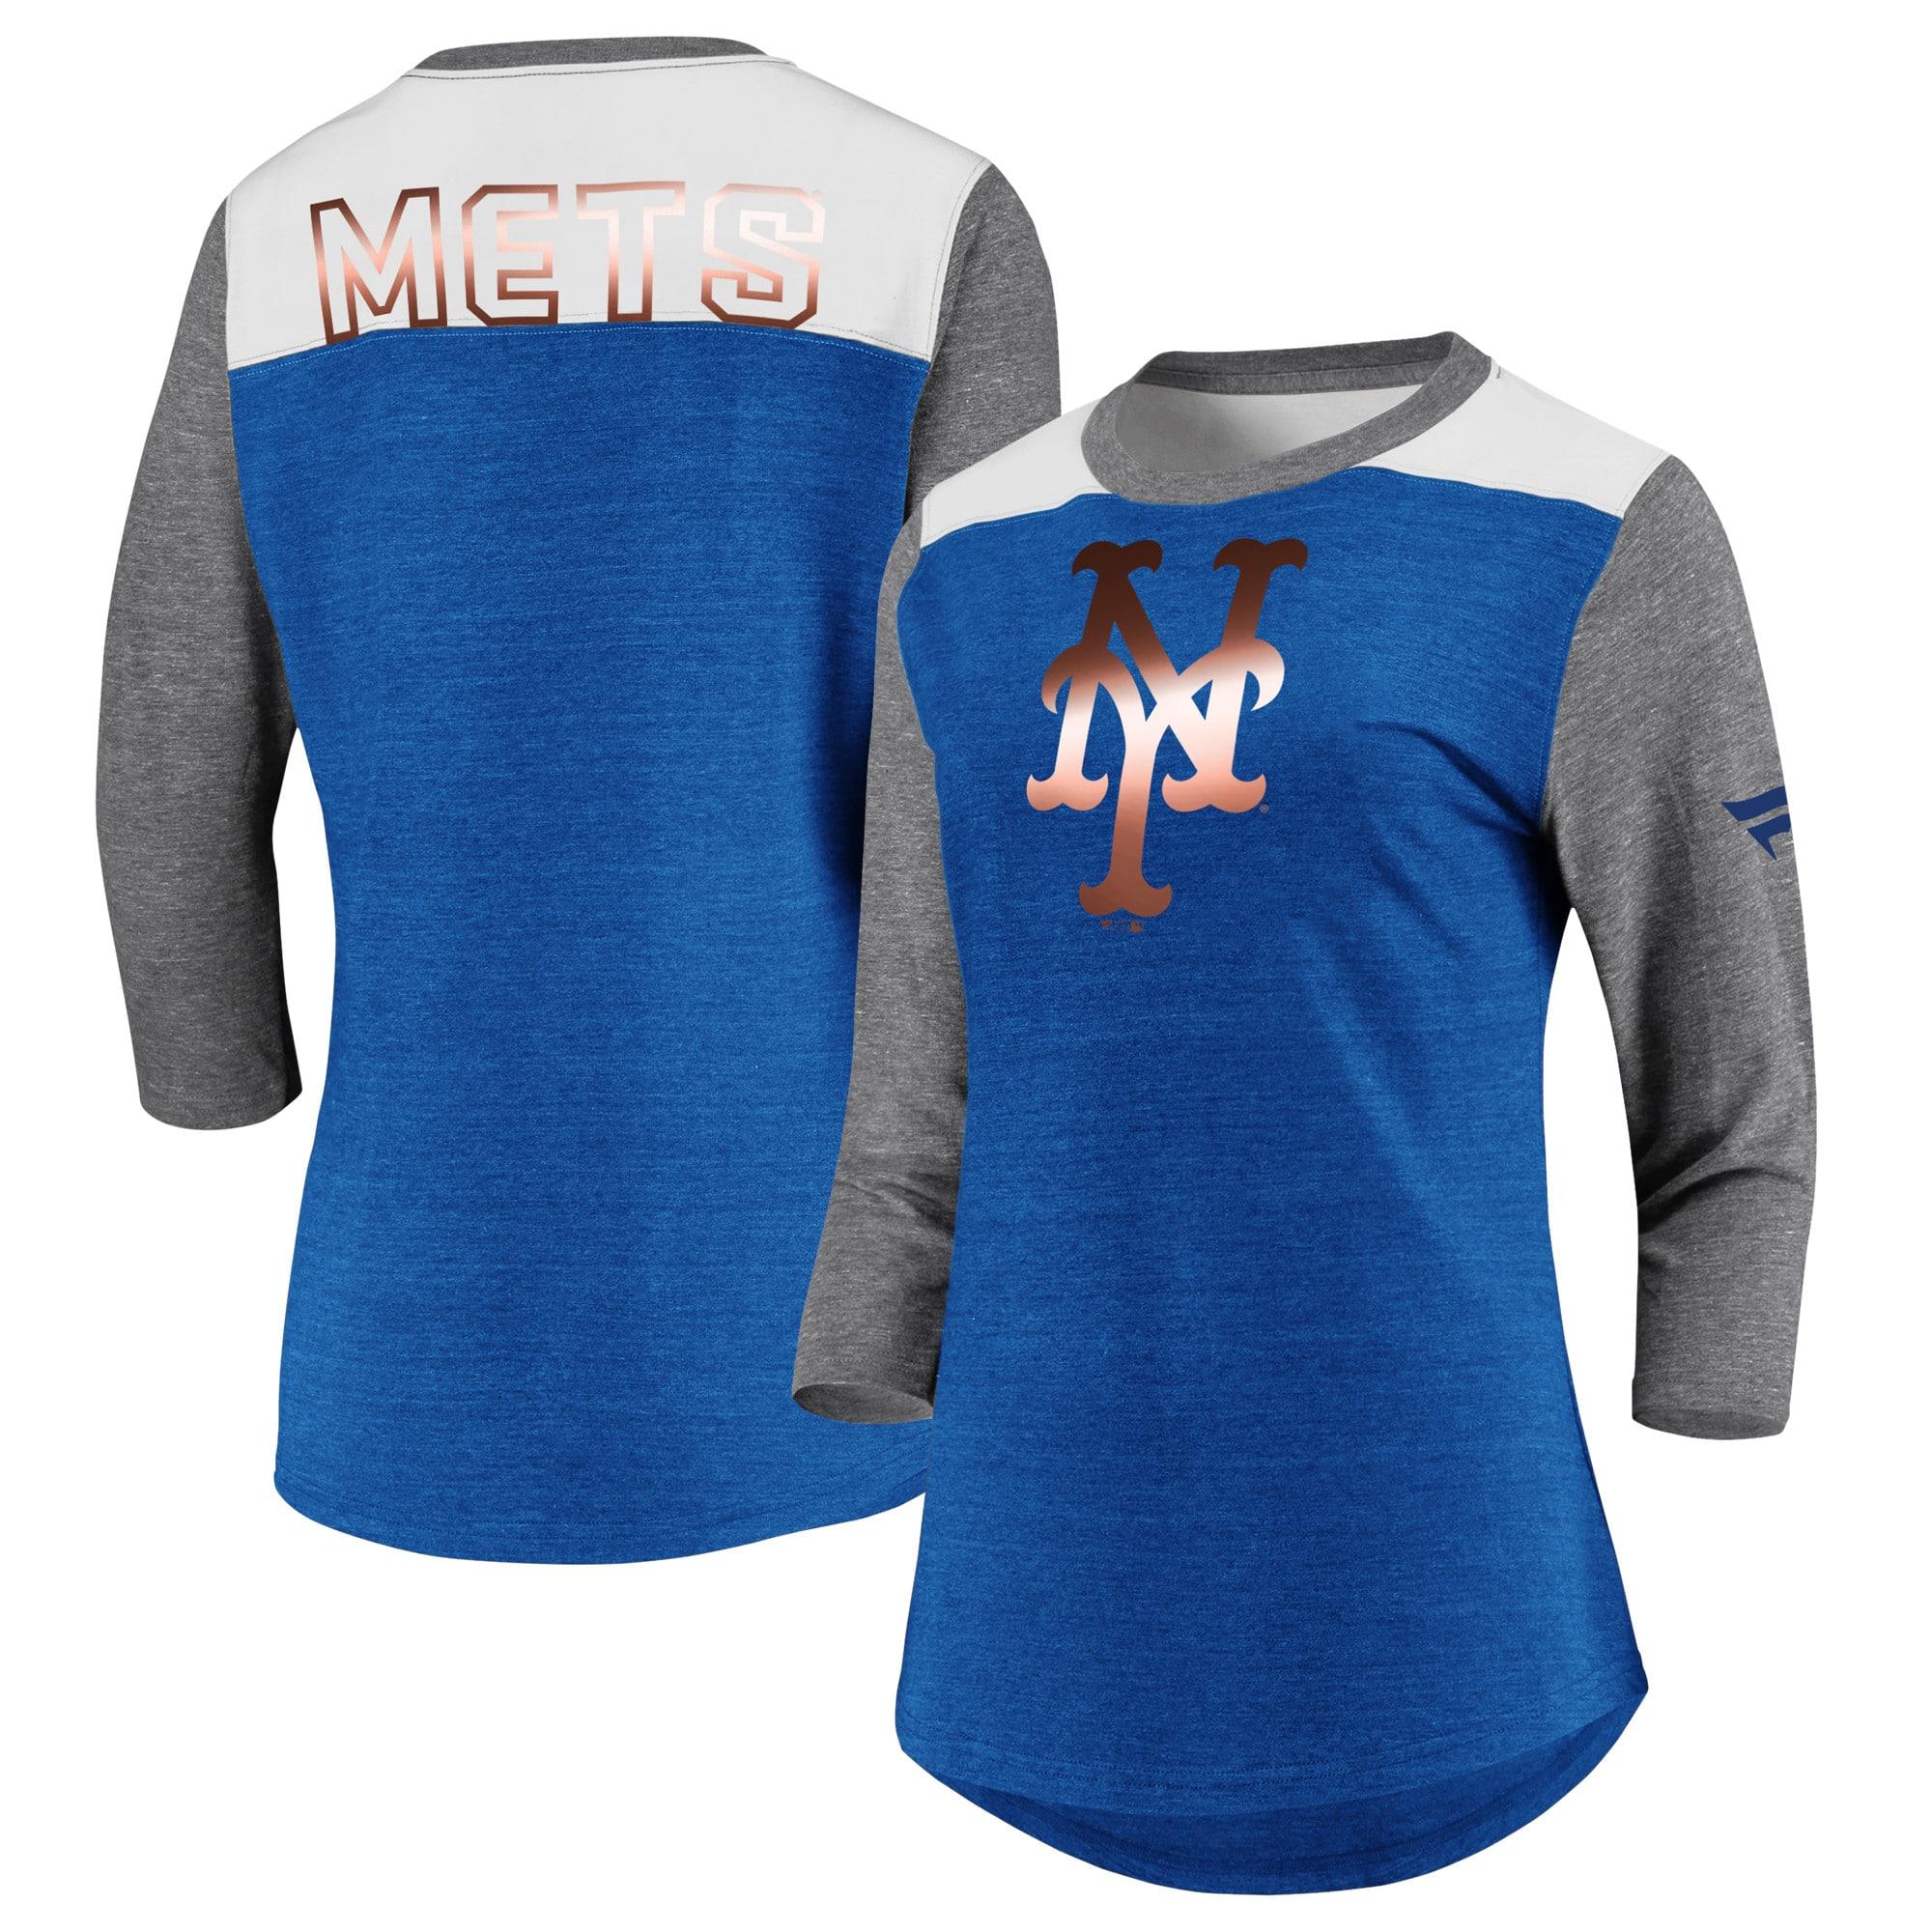 New York Mets Fanatics Branded Women's Iconic Tri-Blend 3/4 Sleeve T-Shirt - Royal/Gray